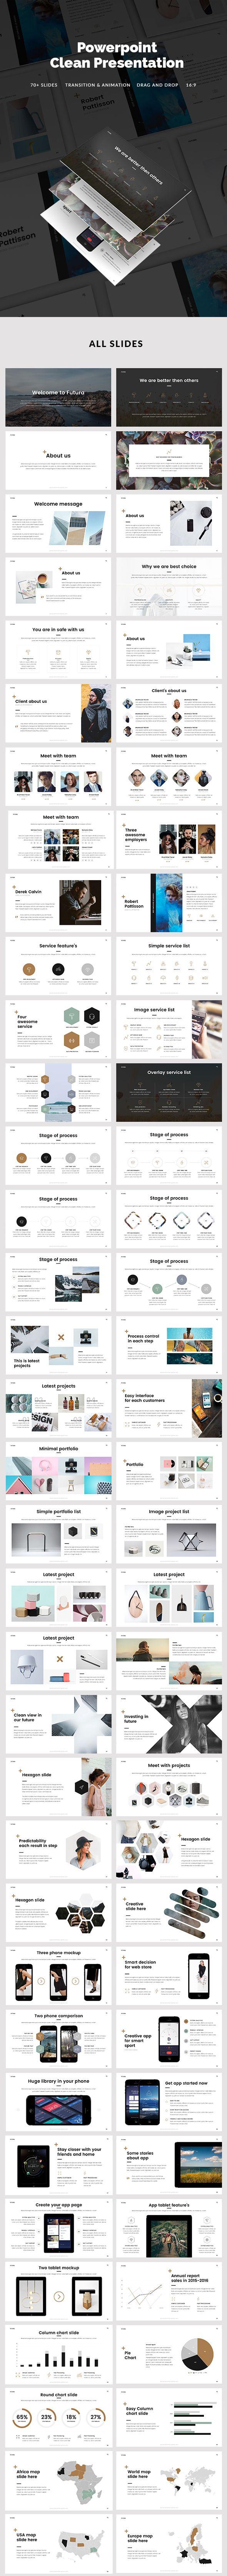 Minimal PowerPoint Presentation Template